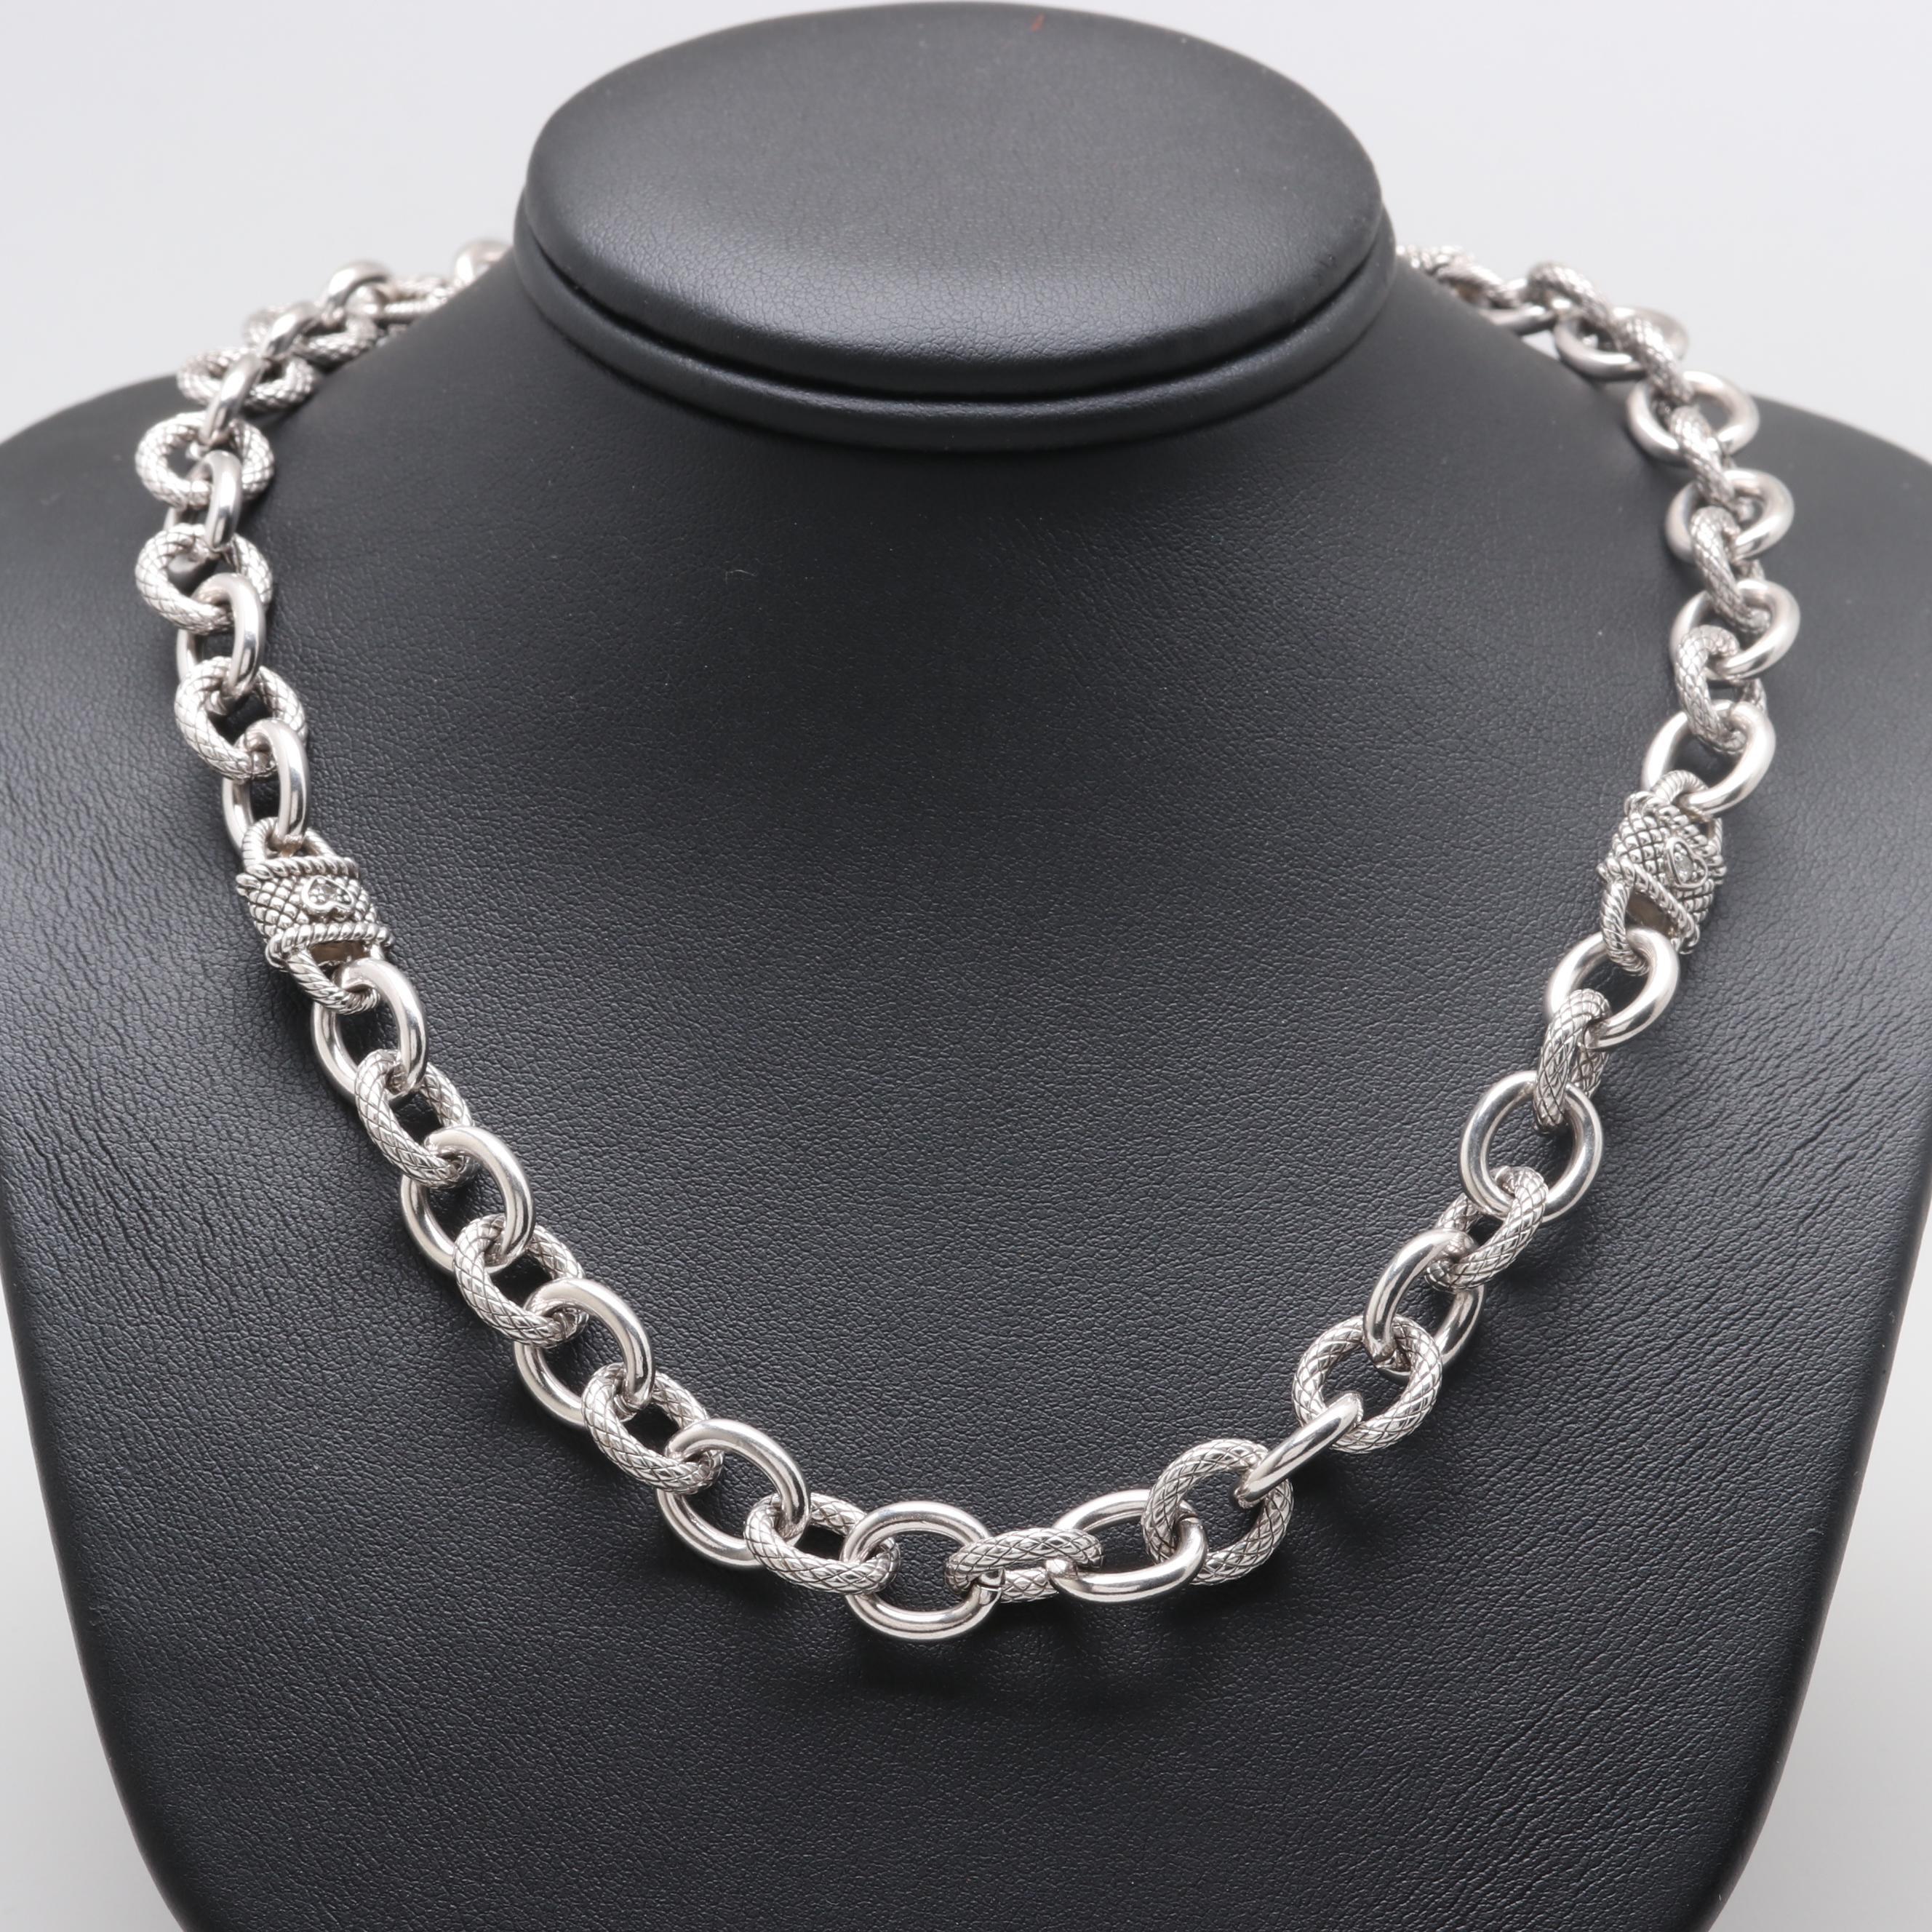 Judith Ripka Sterling Silver Cubic Zirconia Fancy Link Necklace